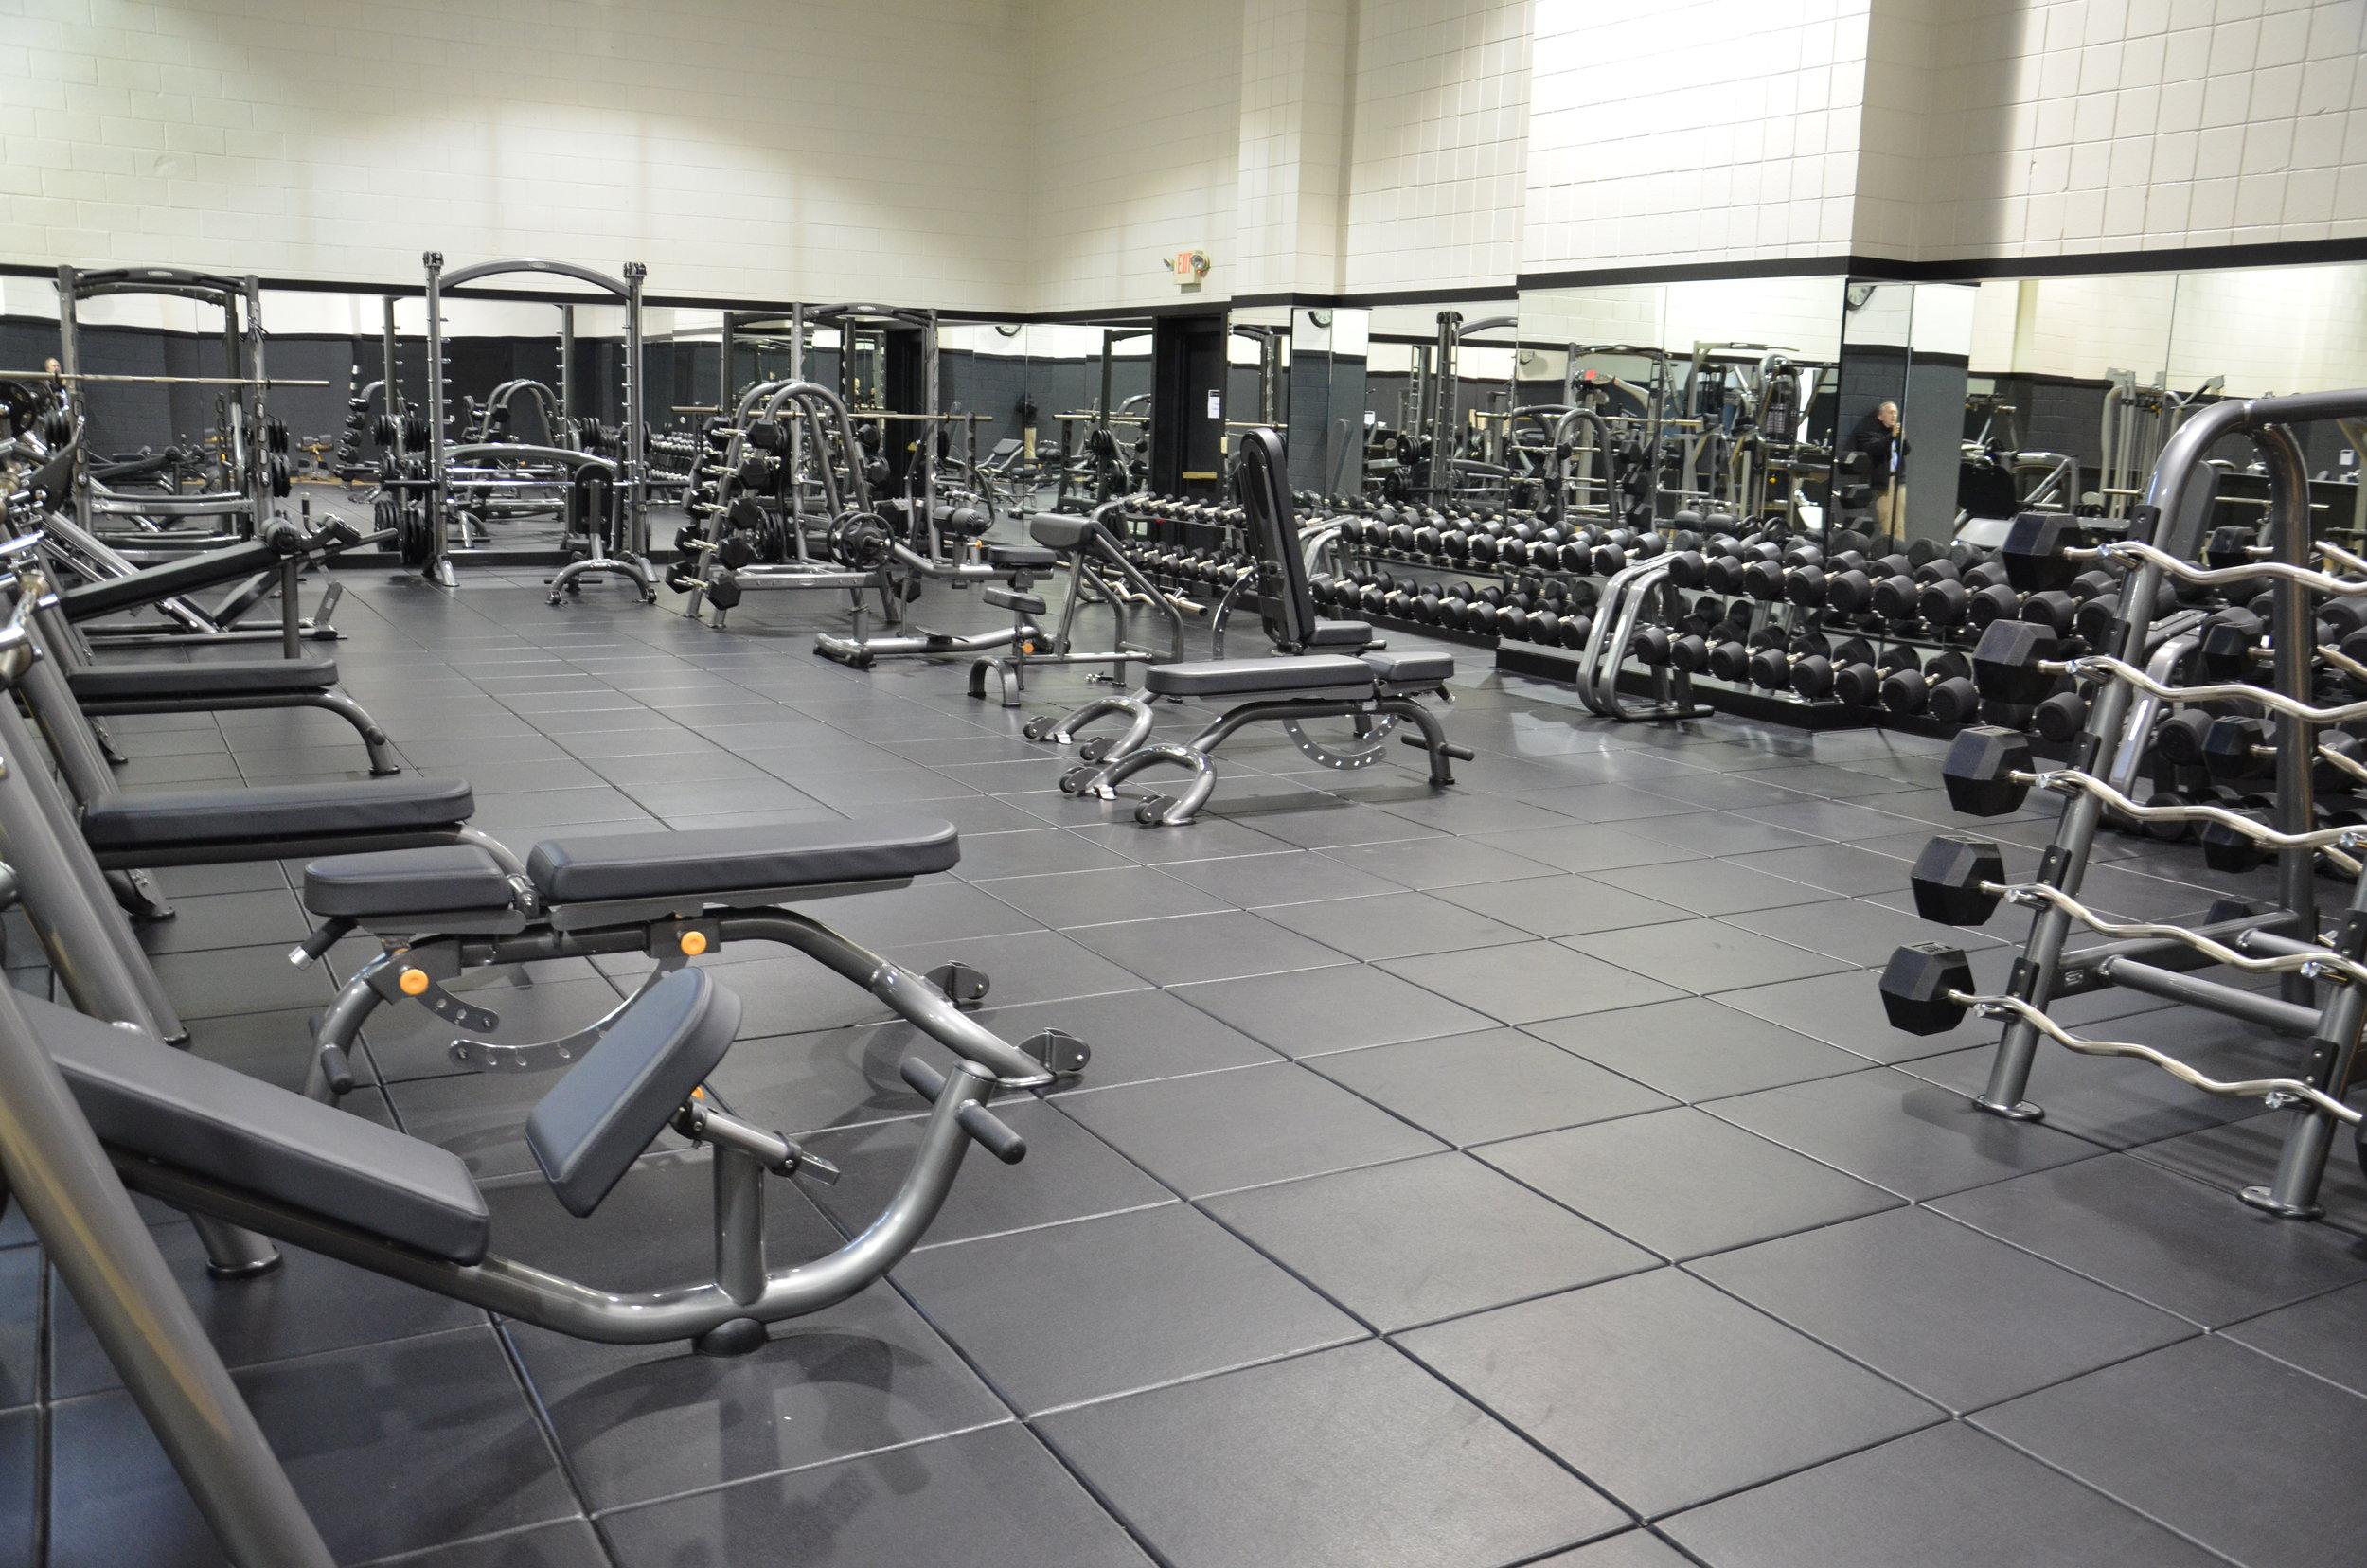 weight room4.JPG